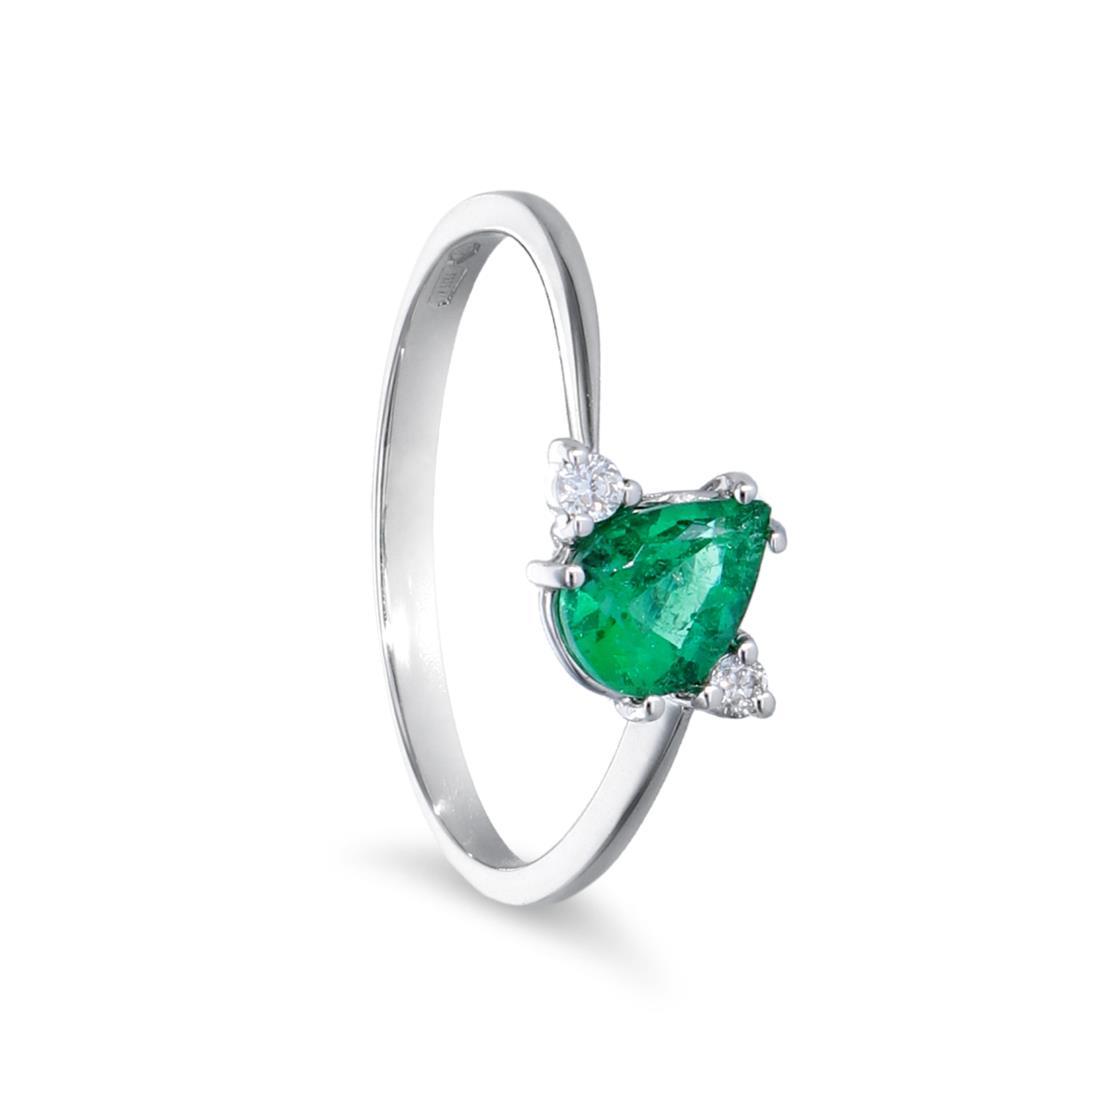 Emerald and diamond ring - ORO&CO